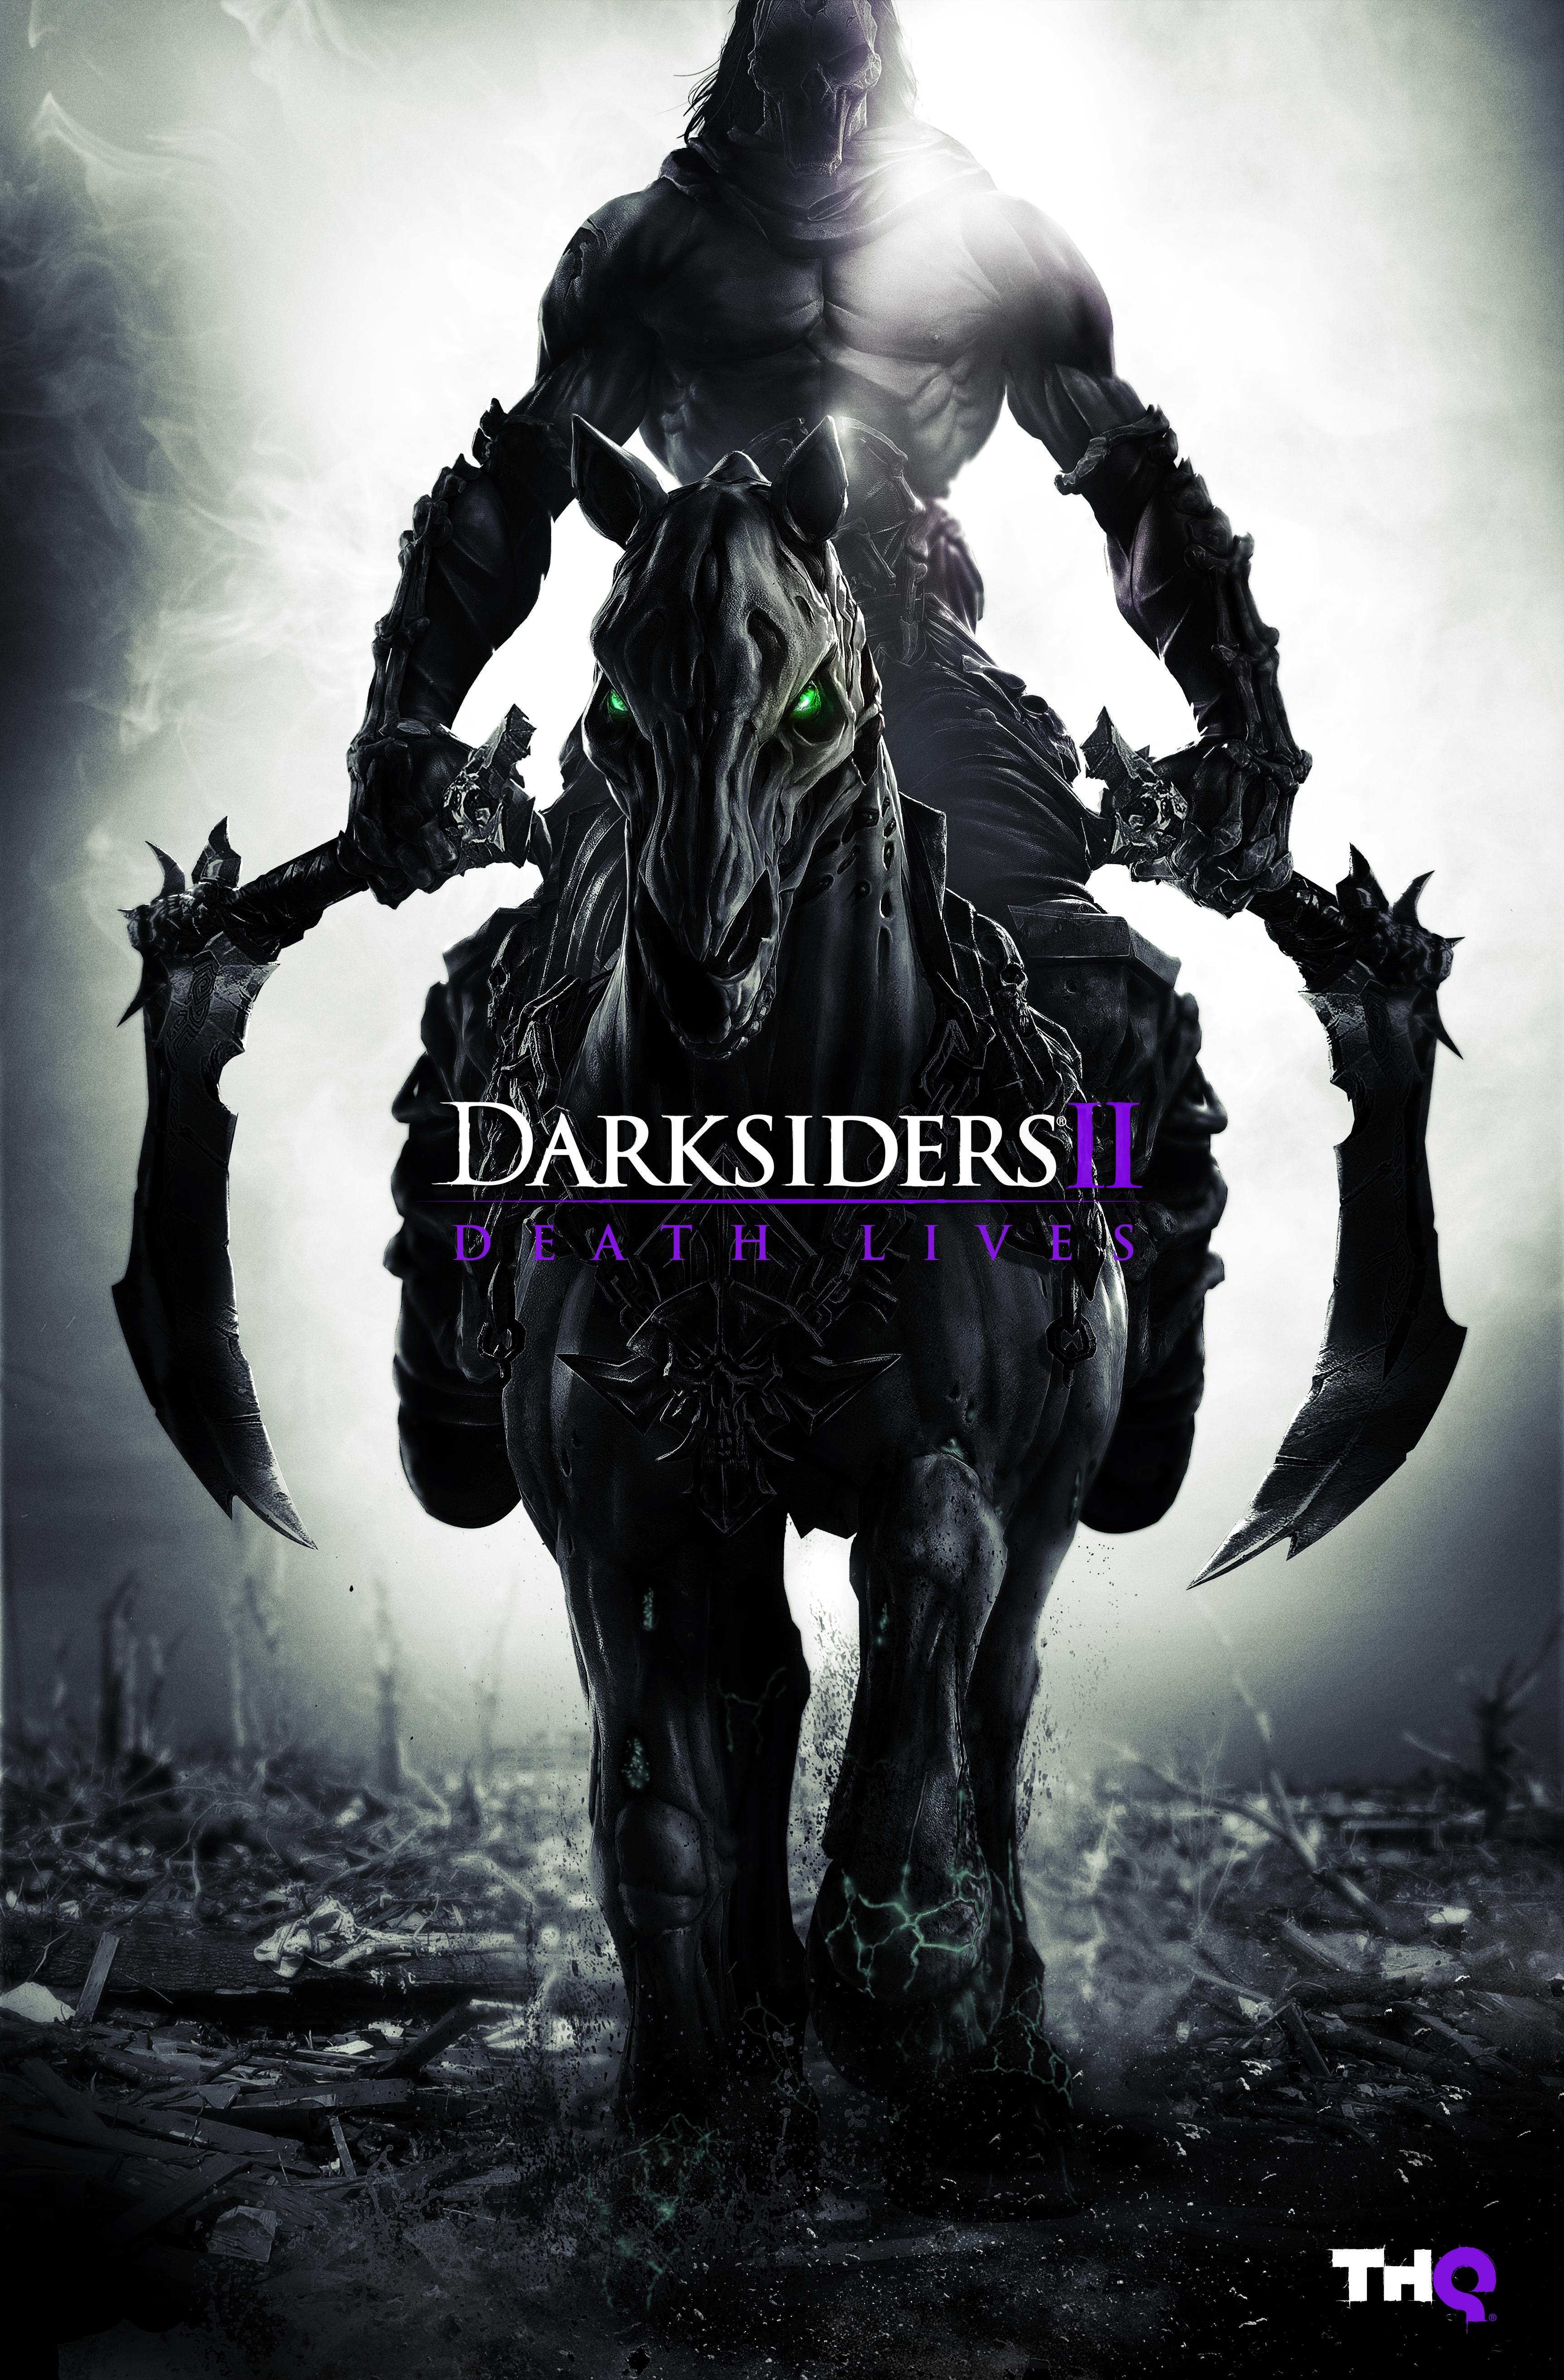 Darksiders II: Death Lives - Page 5